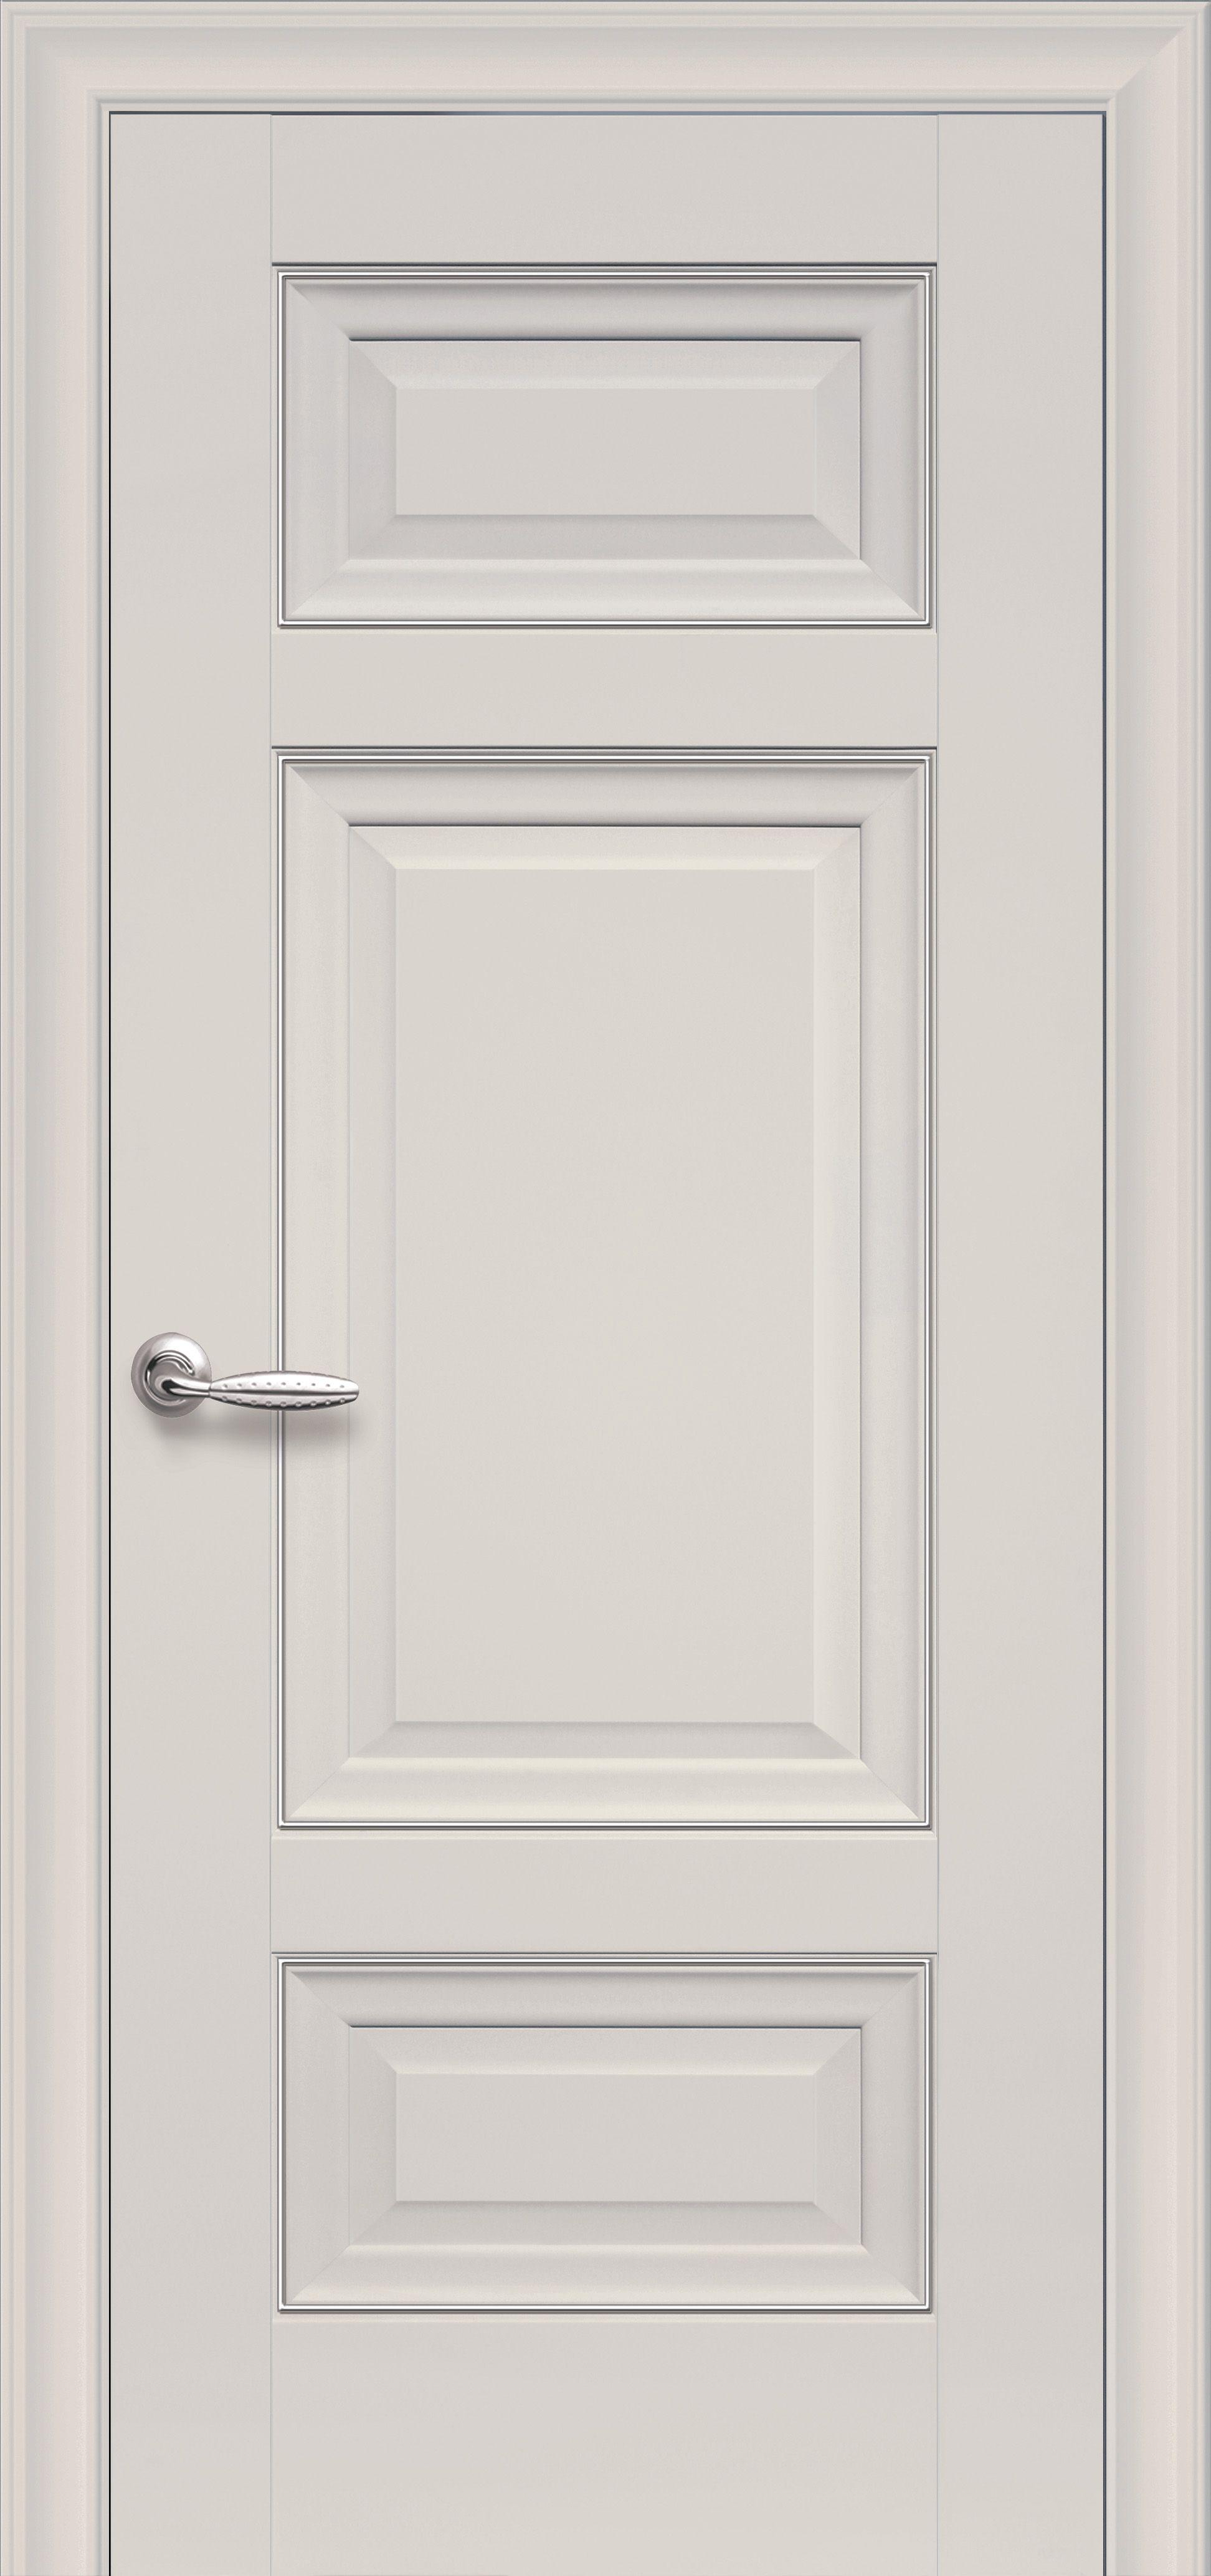 Межкомнатные двери Шарм Глухое с молдингом